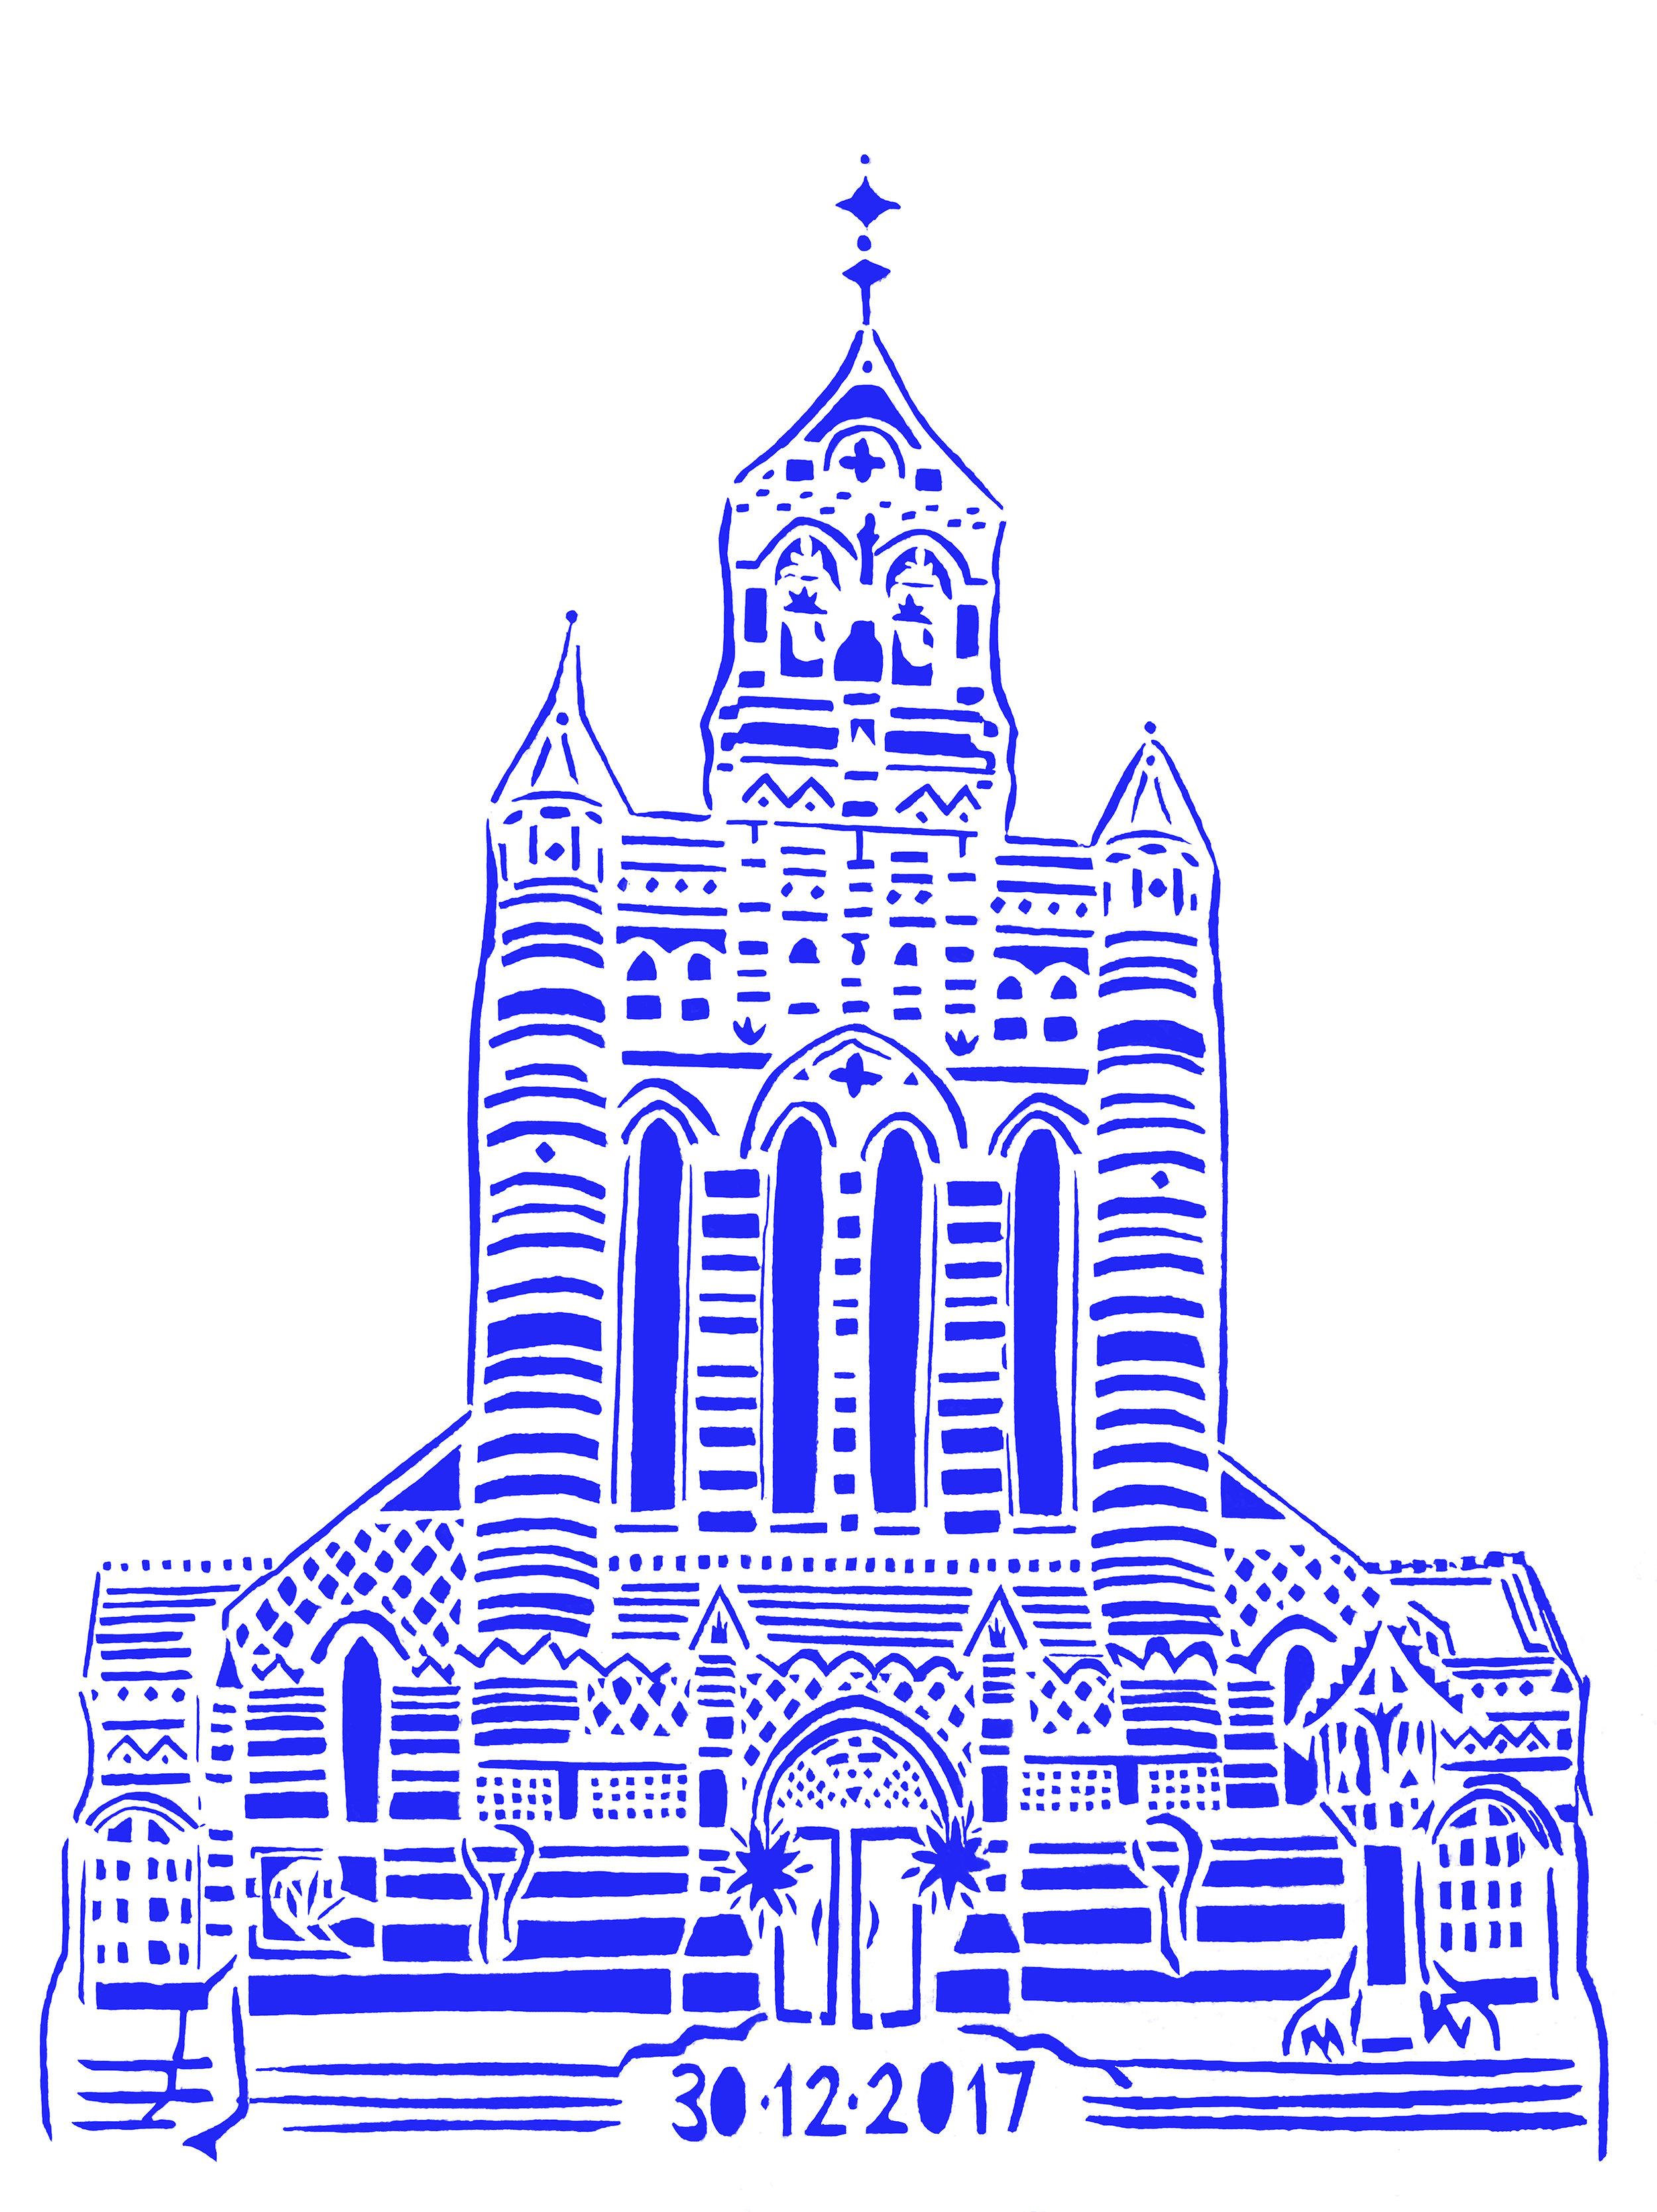 Holy Trinity Brompton Queen's Gate, blue papercut, 21.0 x 29.7cm